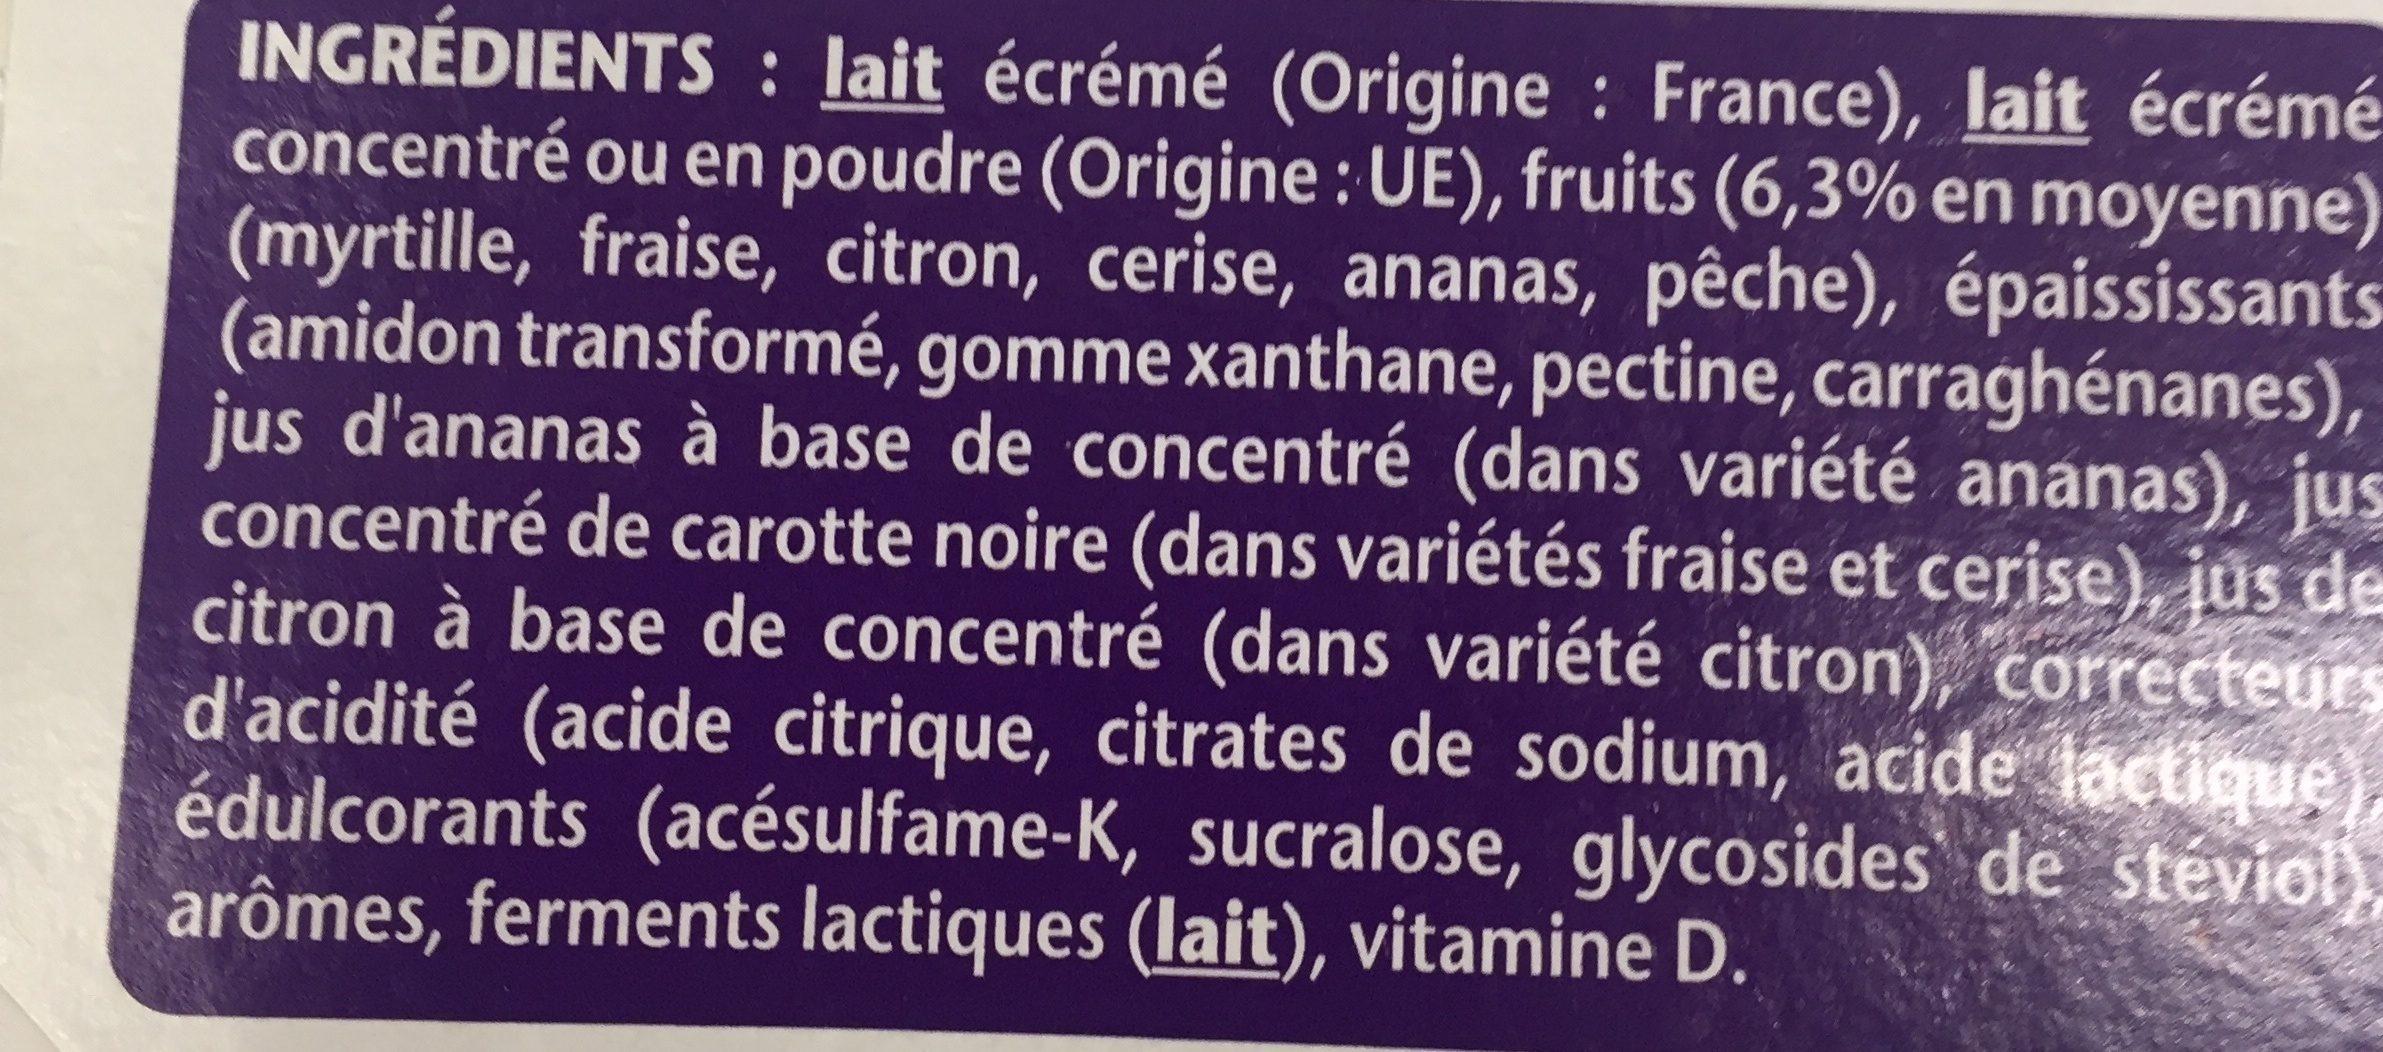 Yaourt taillefine aux fruits - Ingredienti - fr